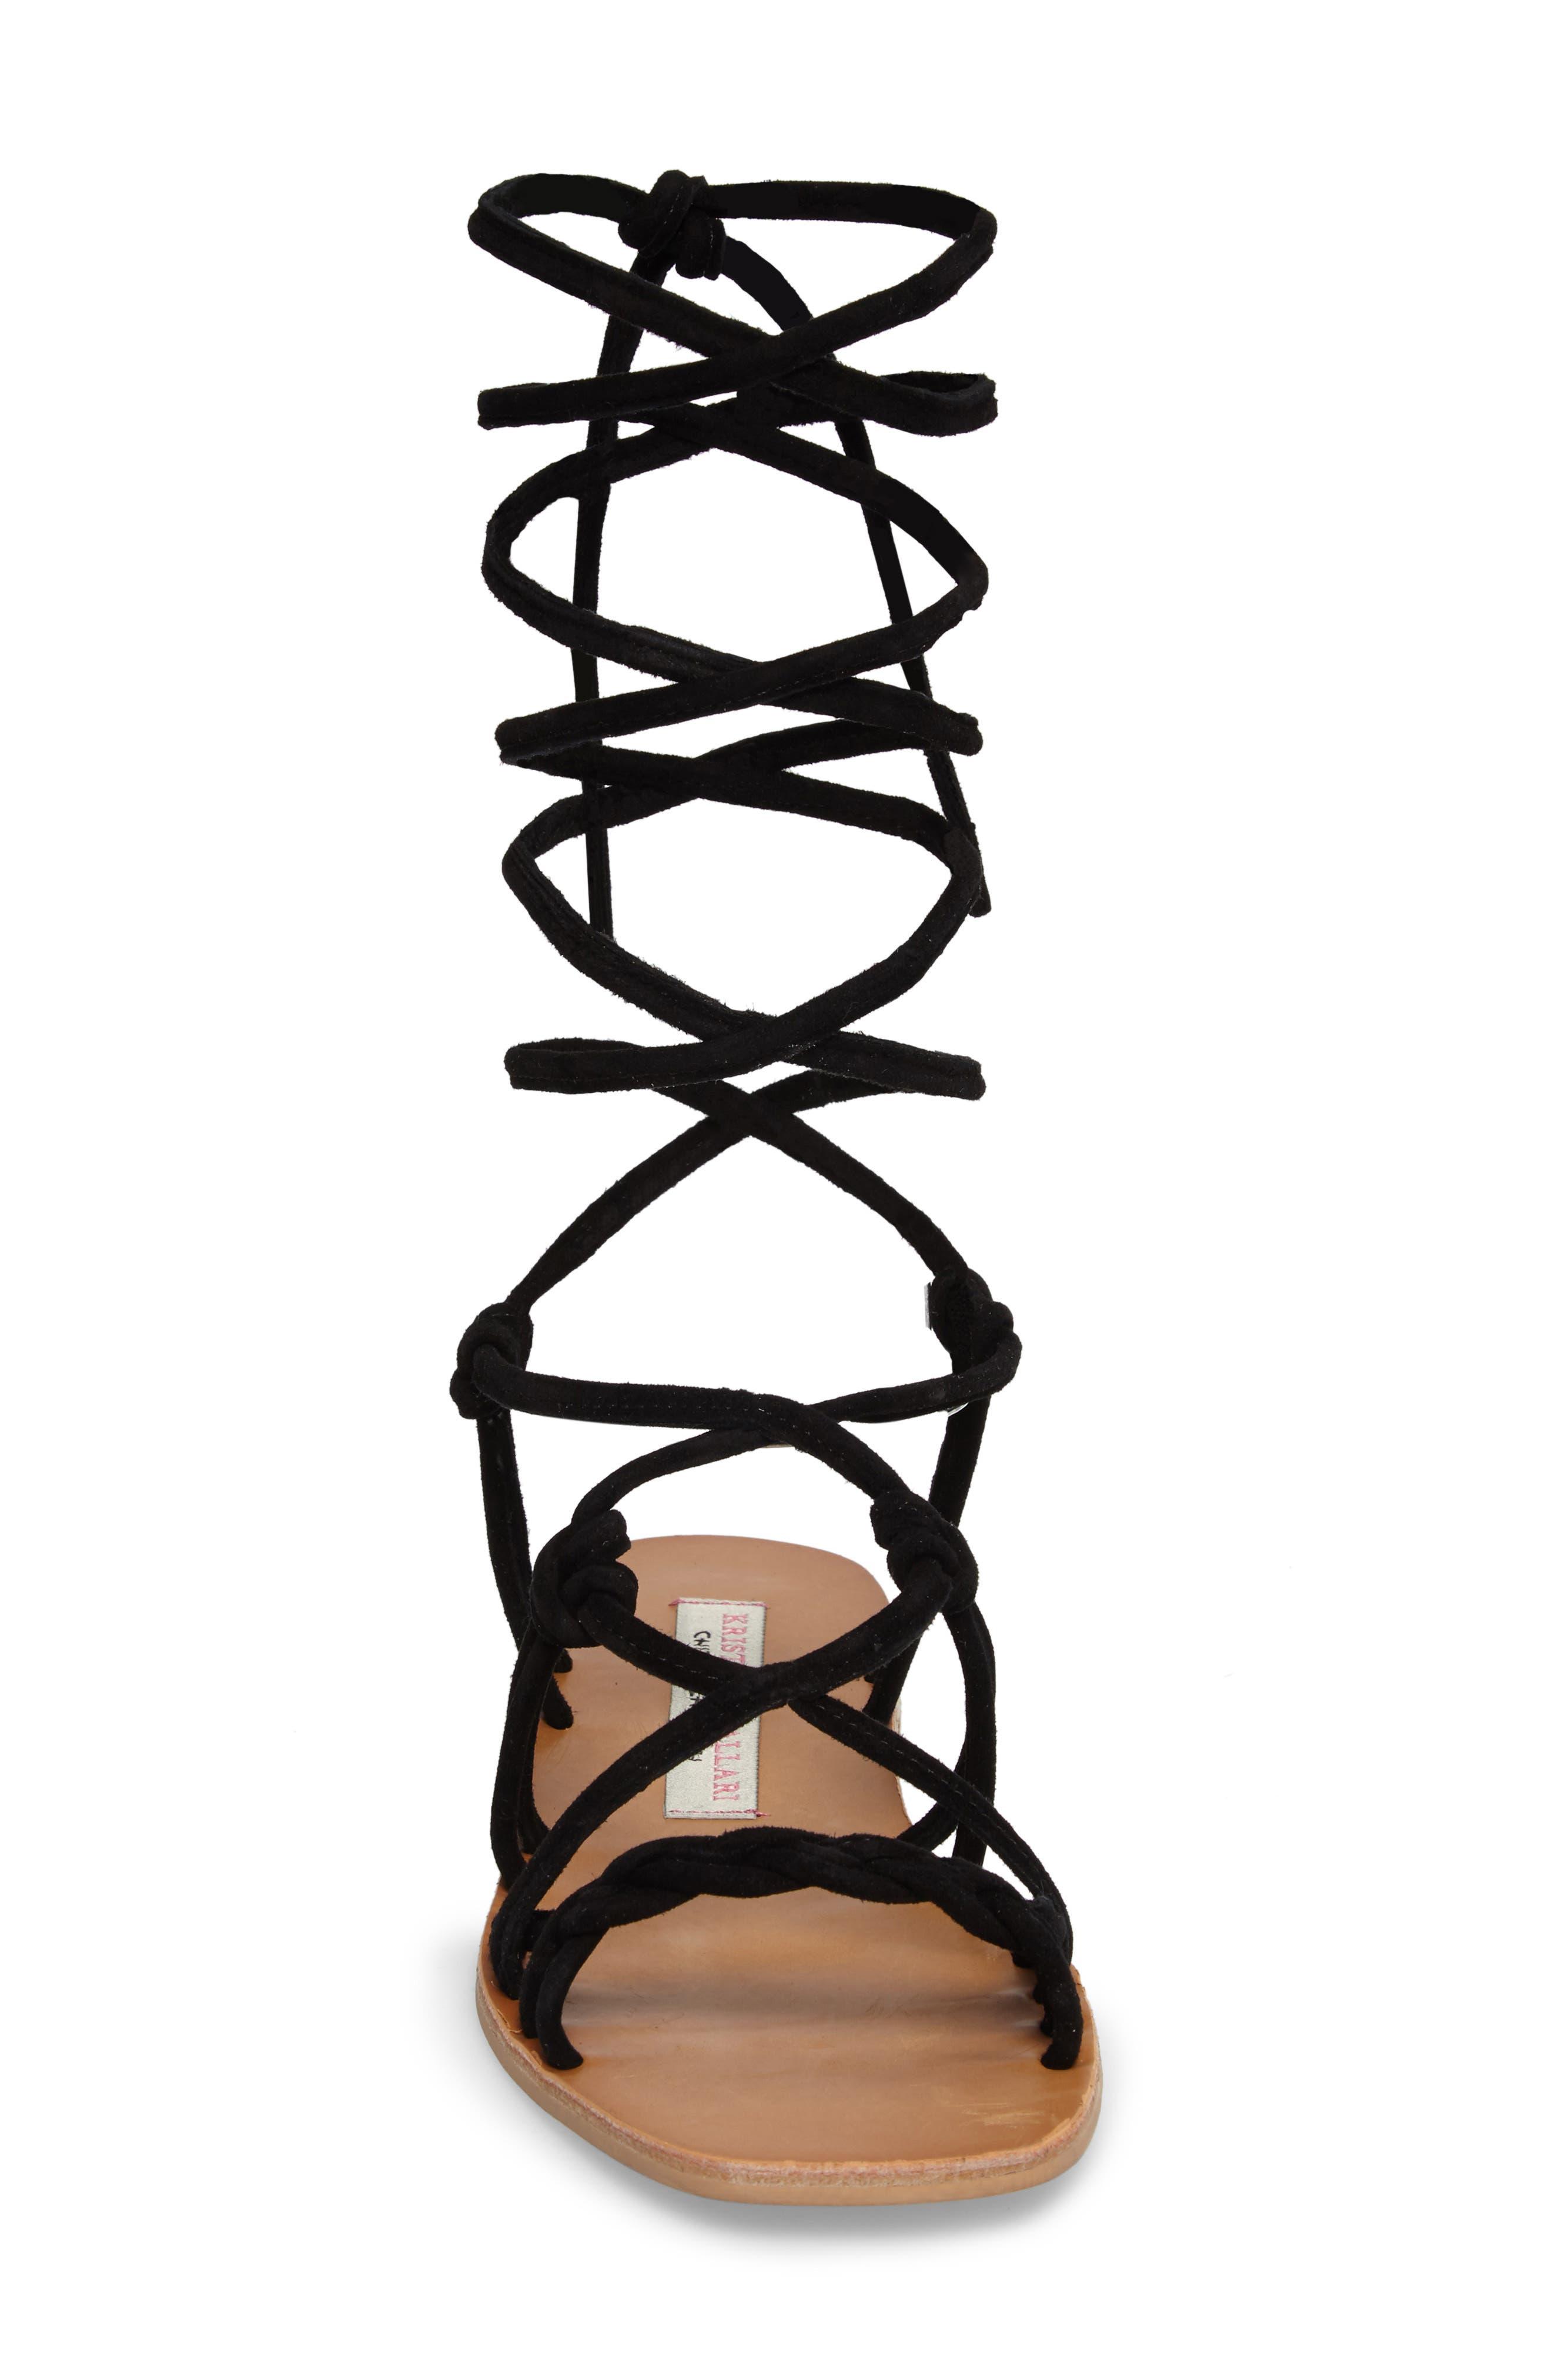 KRISTIN CAVALLARI,                             Tori Knotted Wraparound Sandal,                             Alternate thumbnail 4, color,                             001